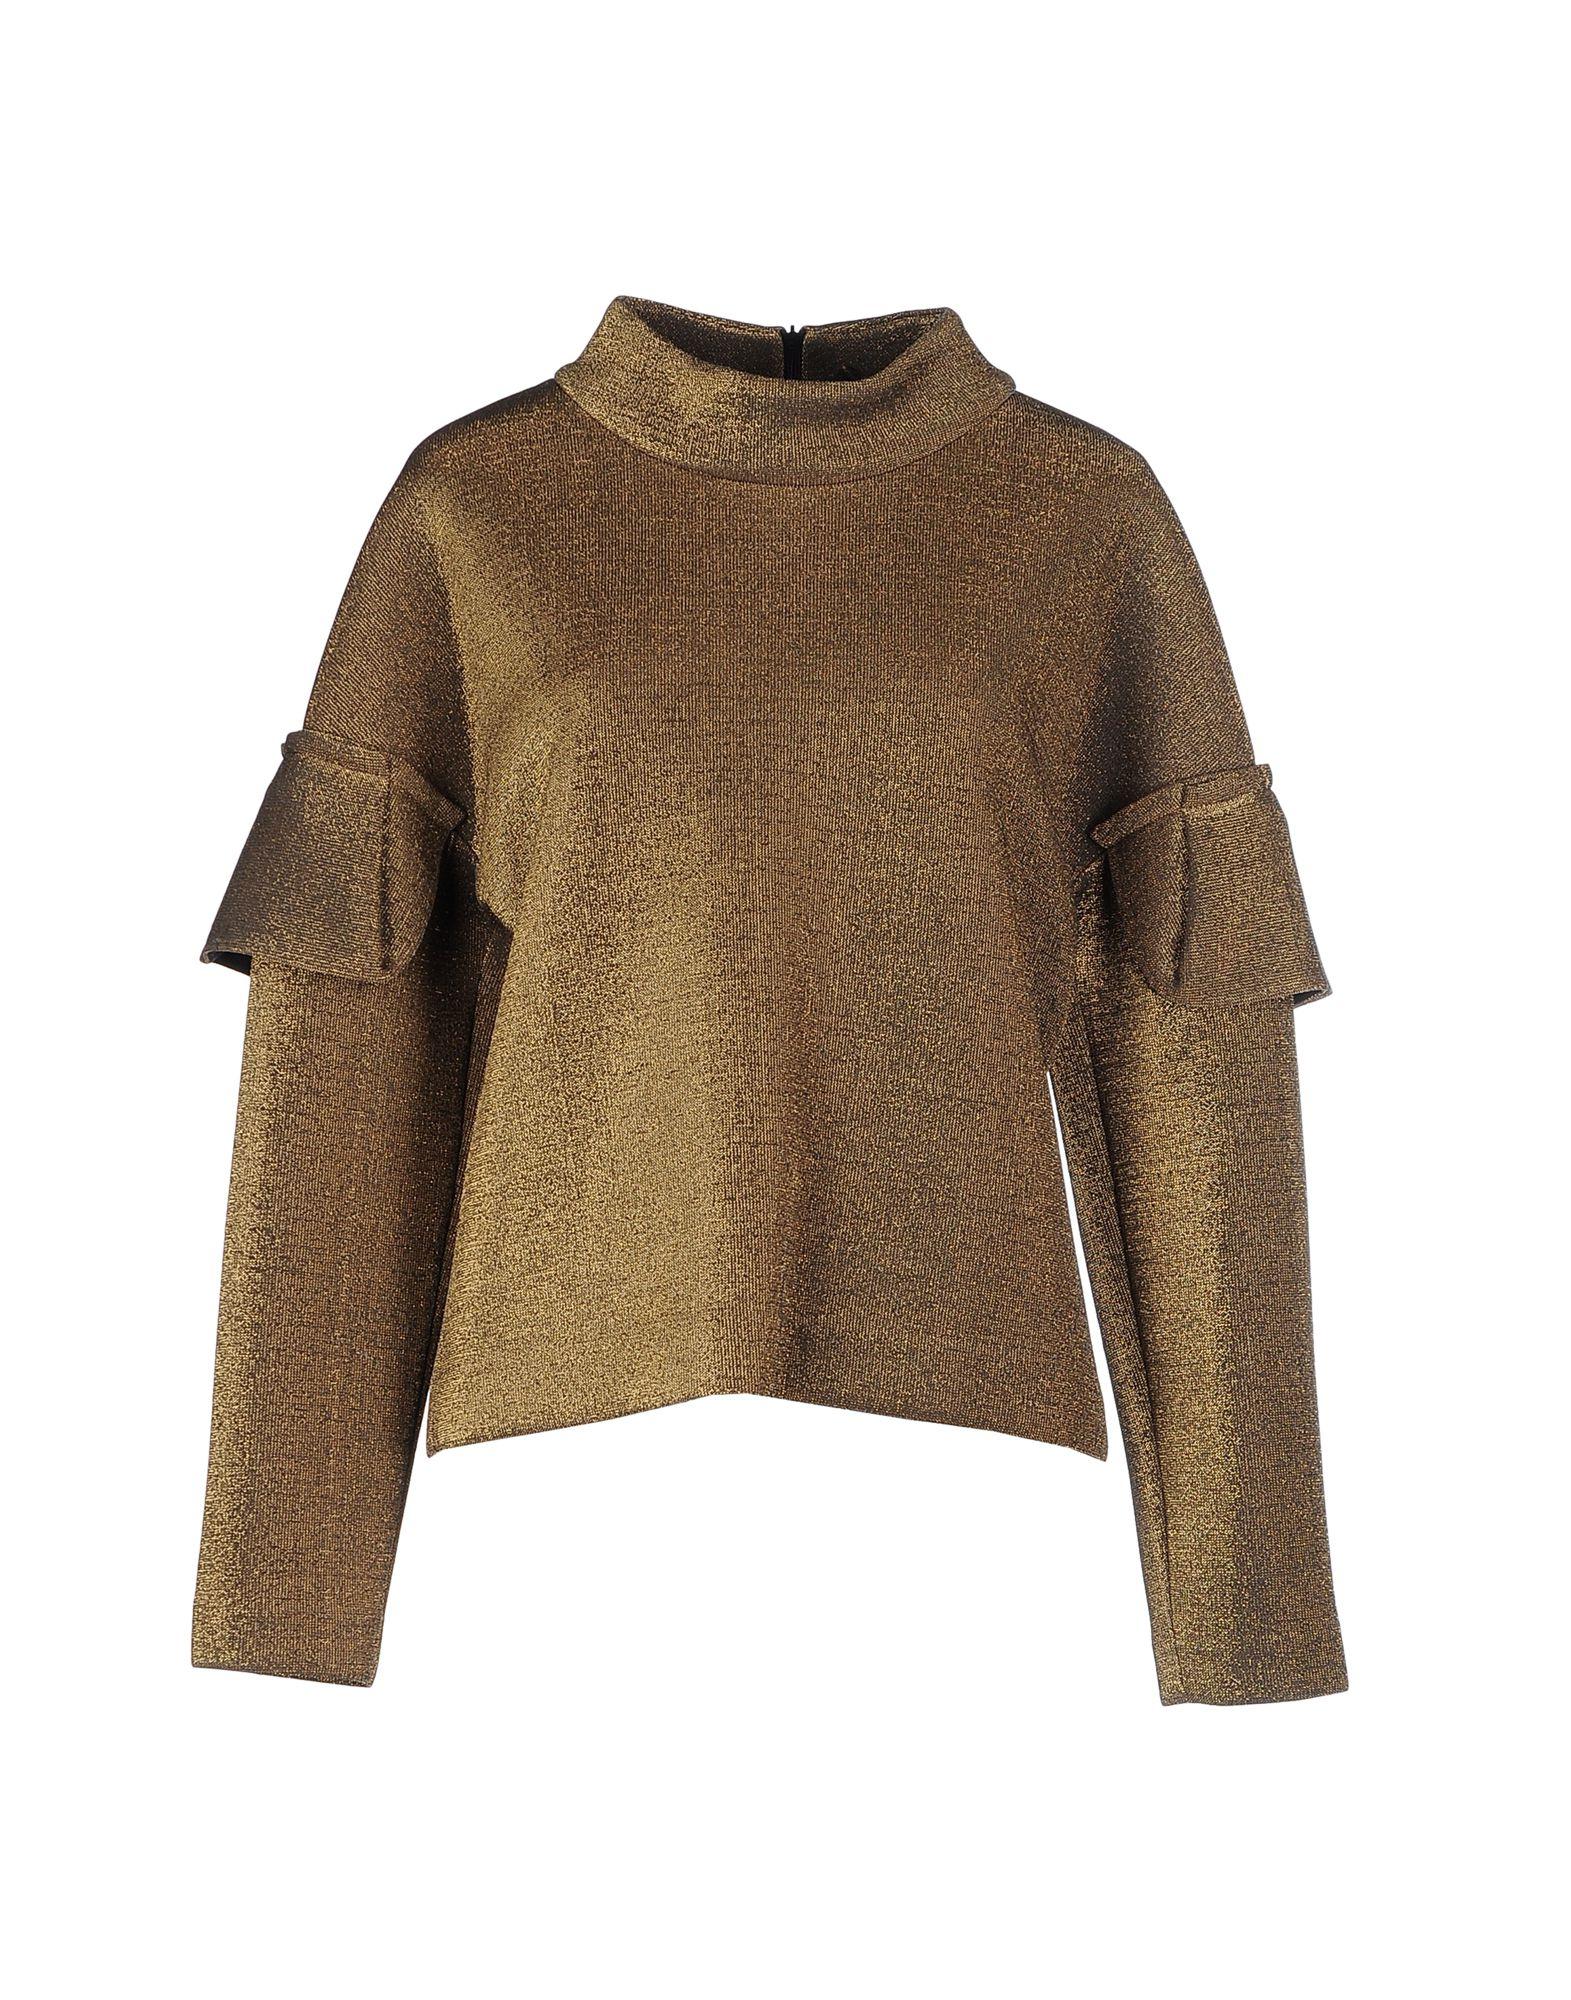 Space Style Concept Sweatshirt   Women Space Style Concept Sweatshirts   37843244